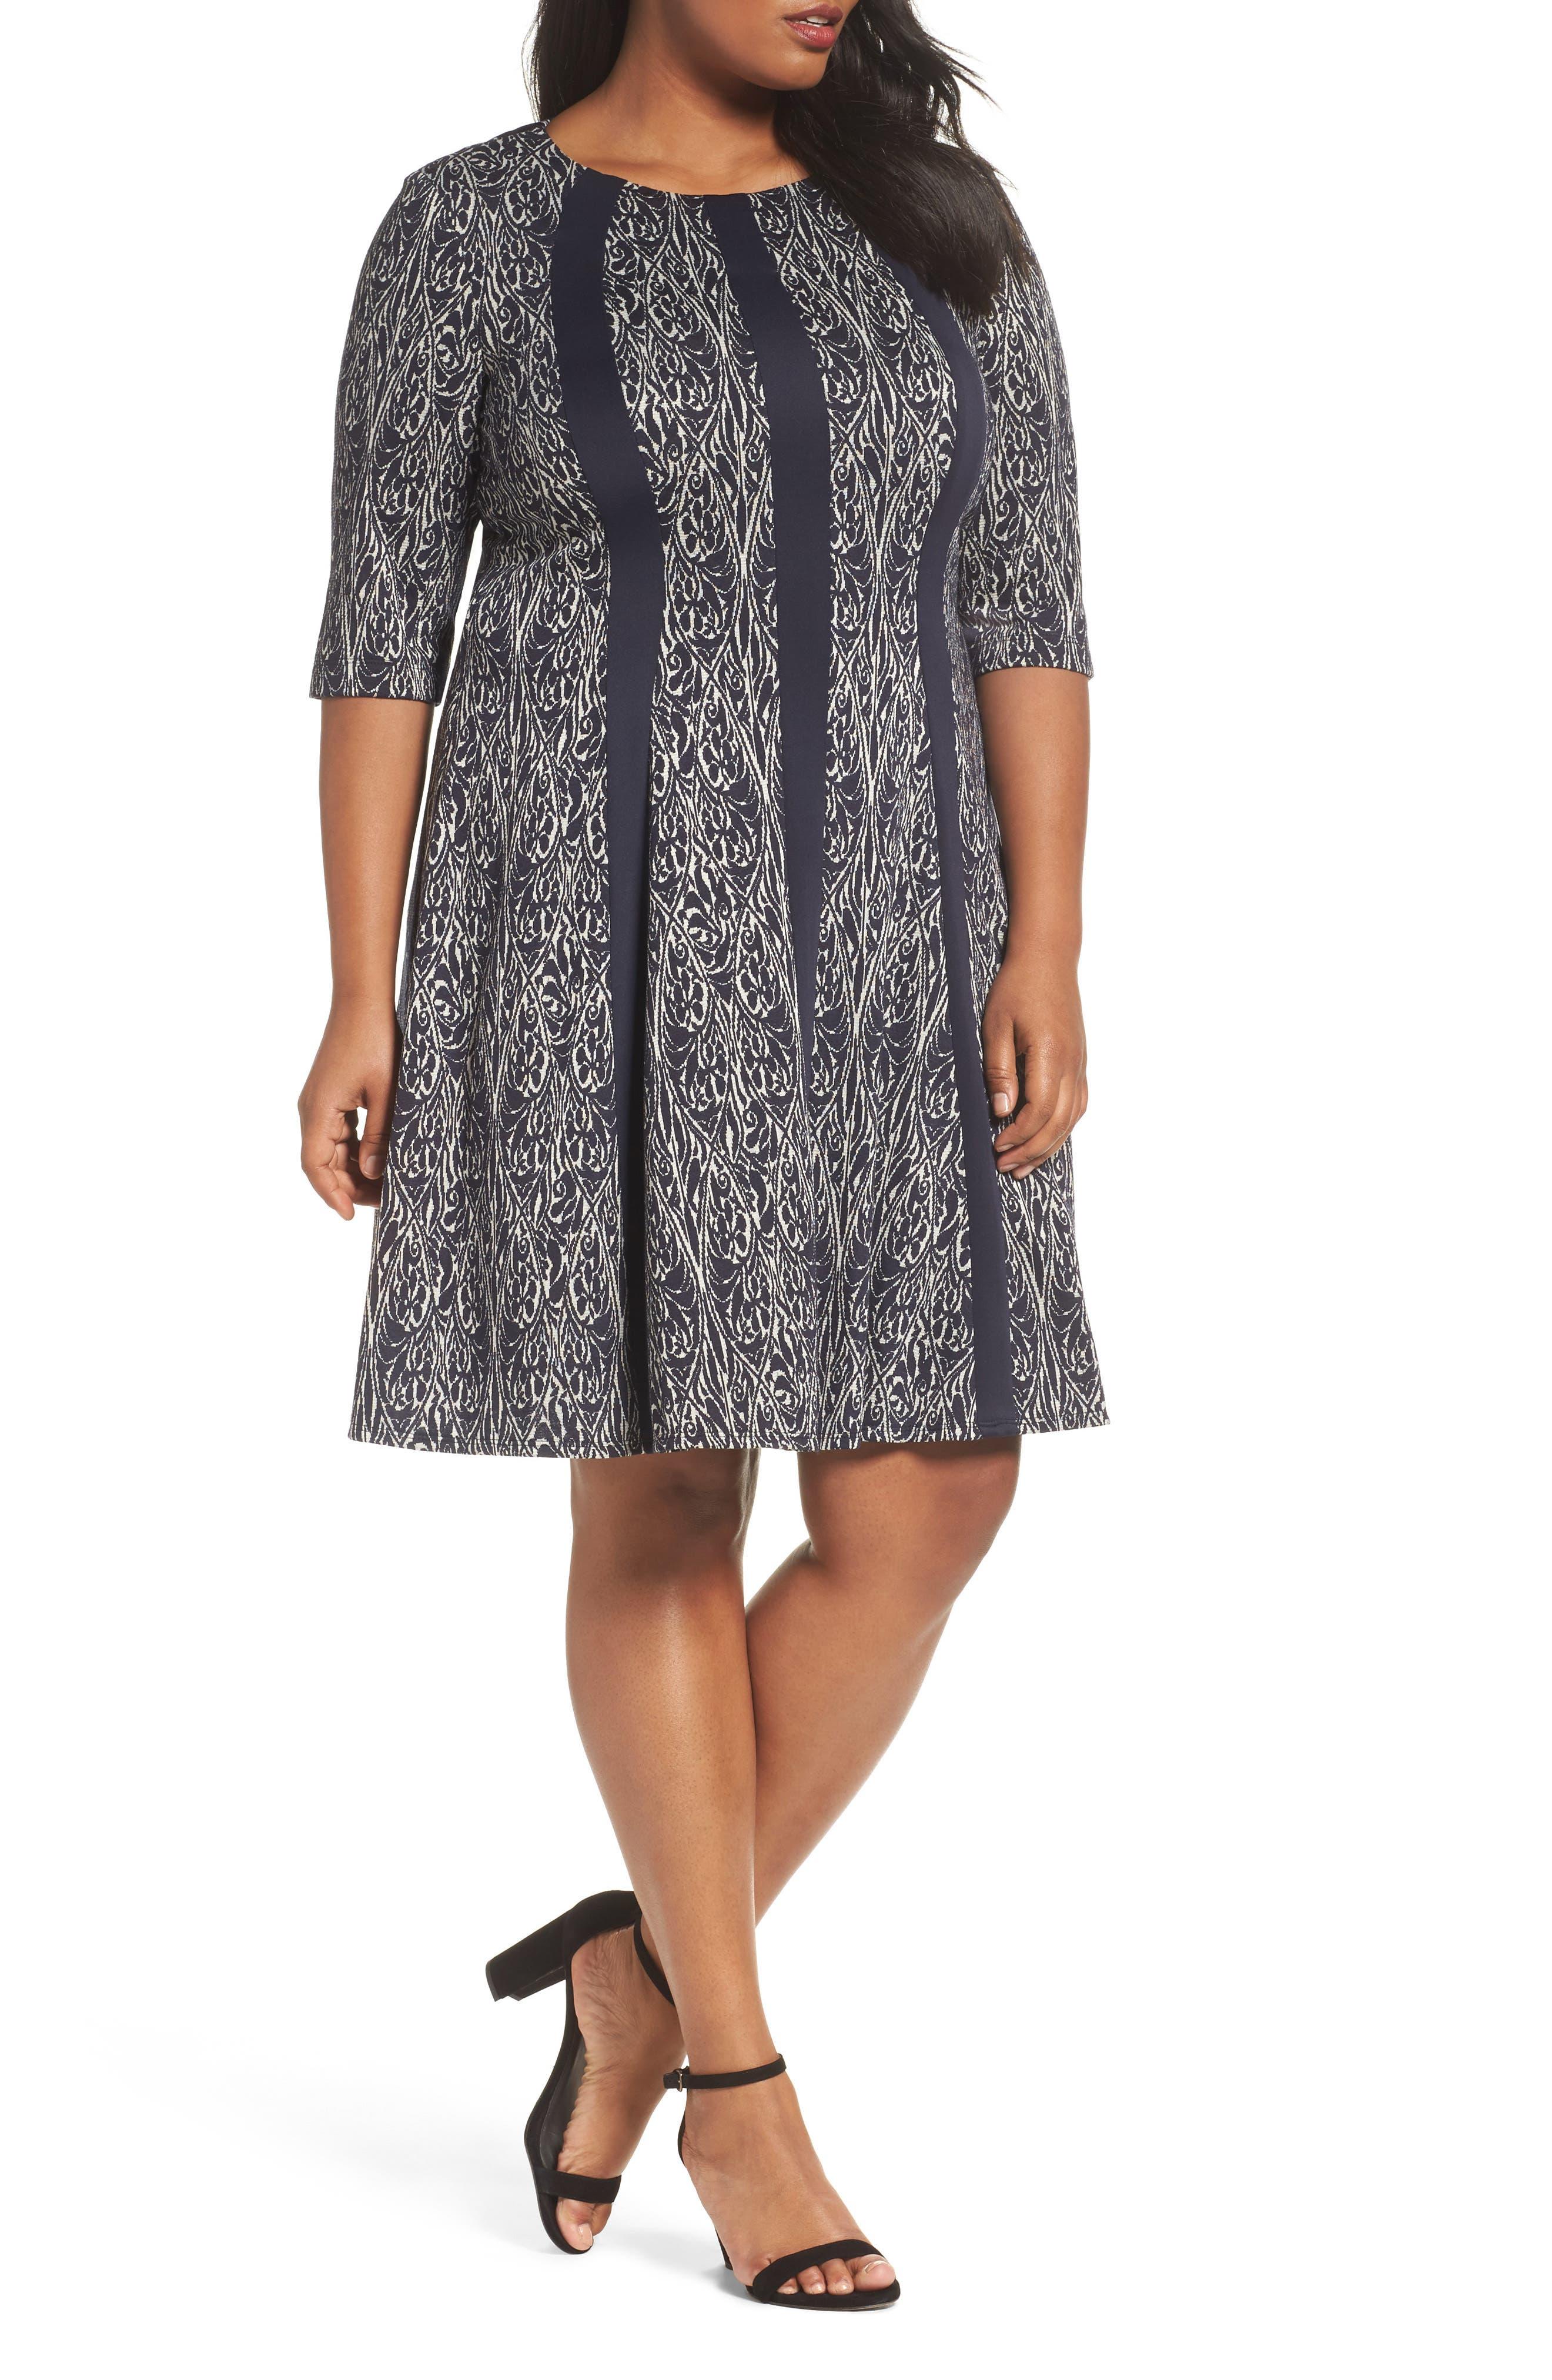 Gabby Skye Jacquard Knit A-Line Dress (Plus Size)